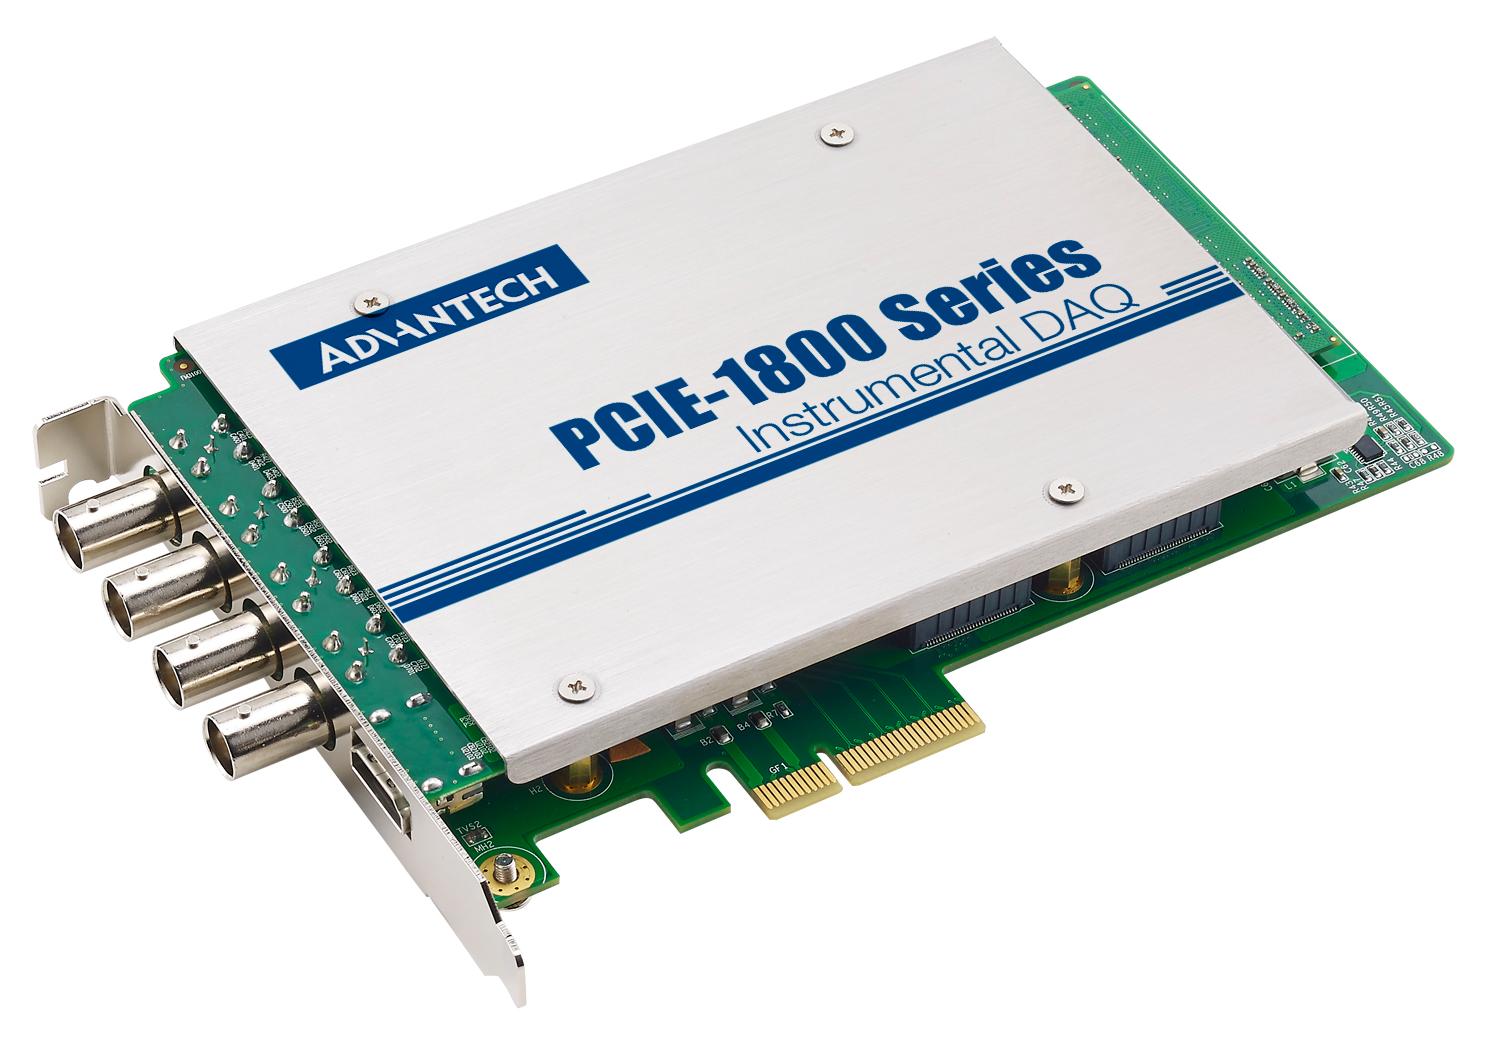 Advantech PCIE-1840